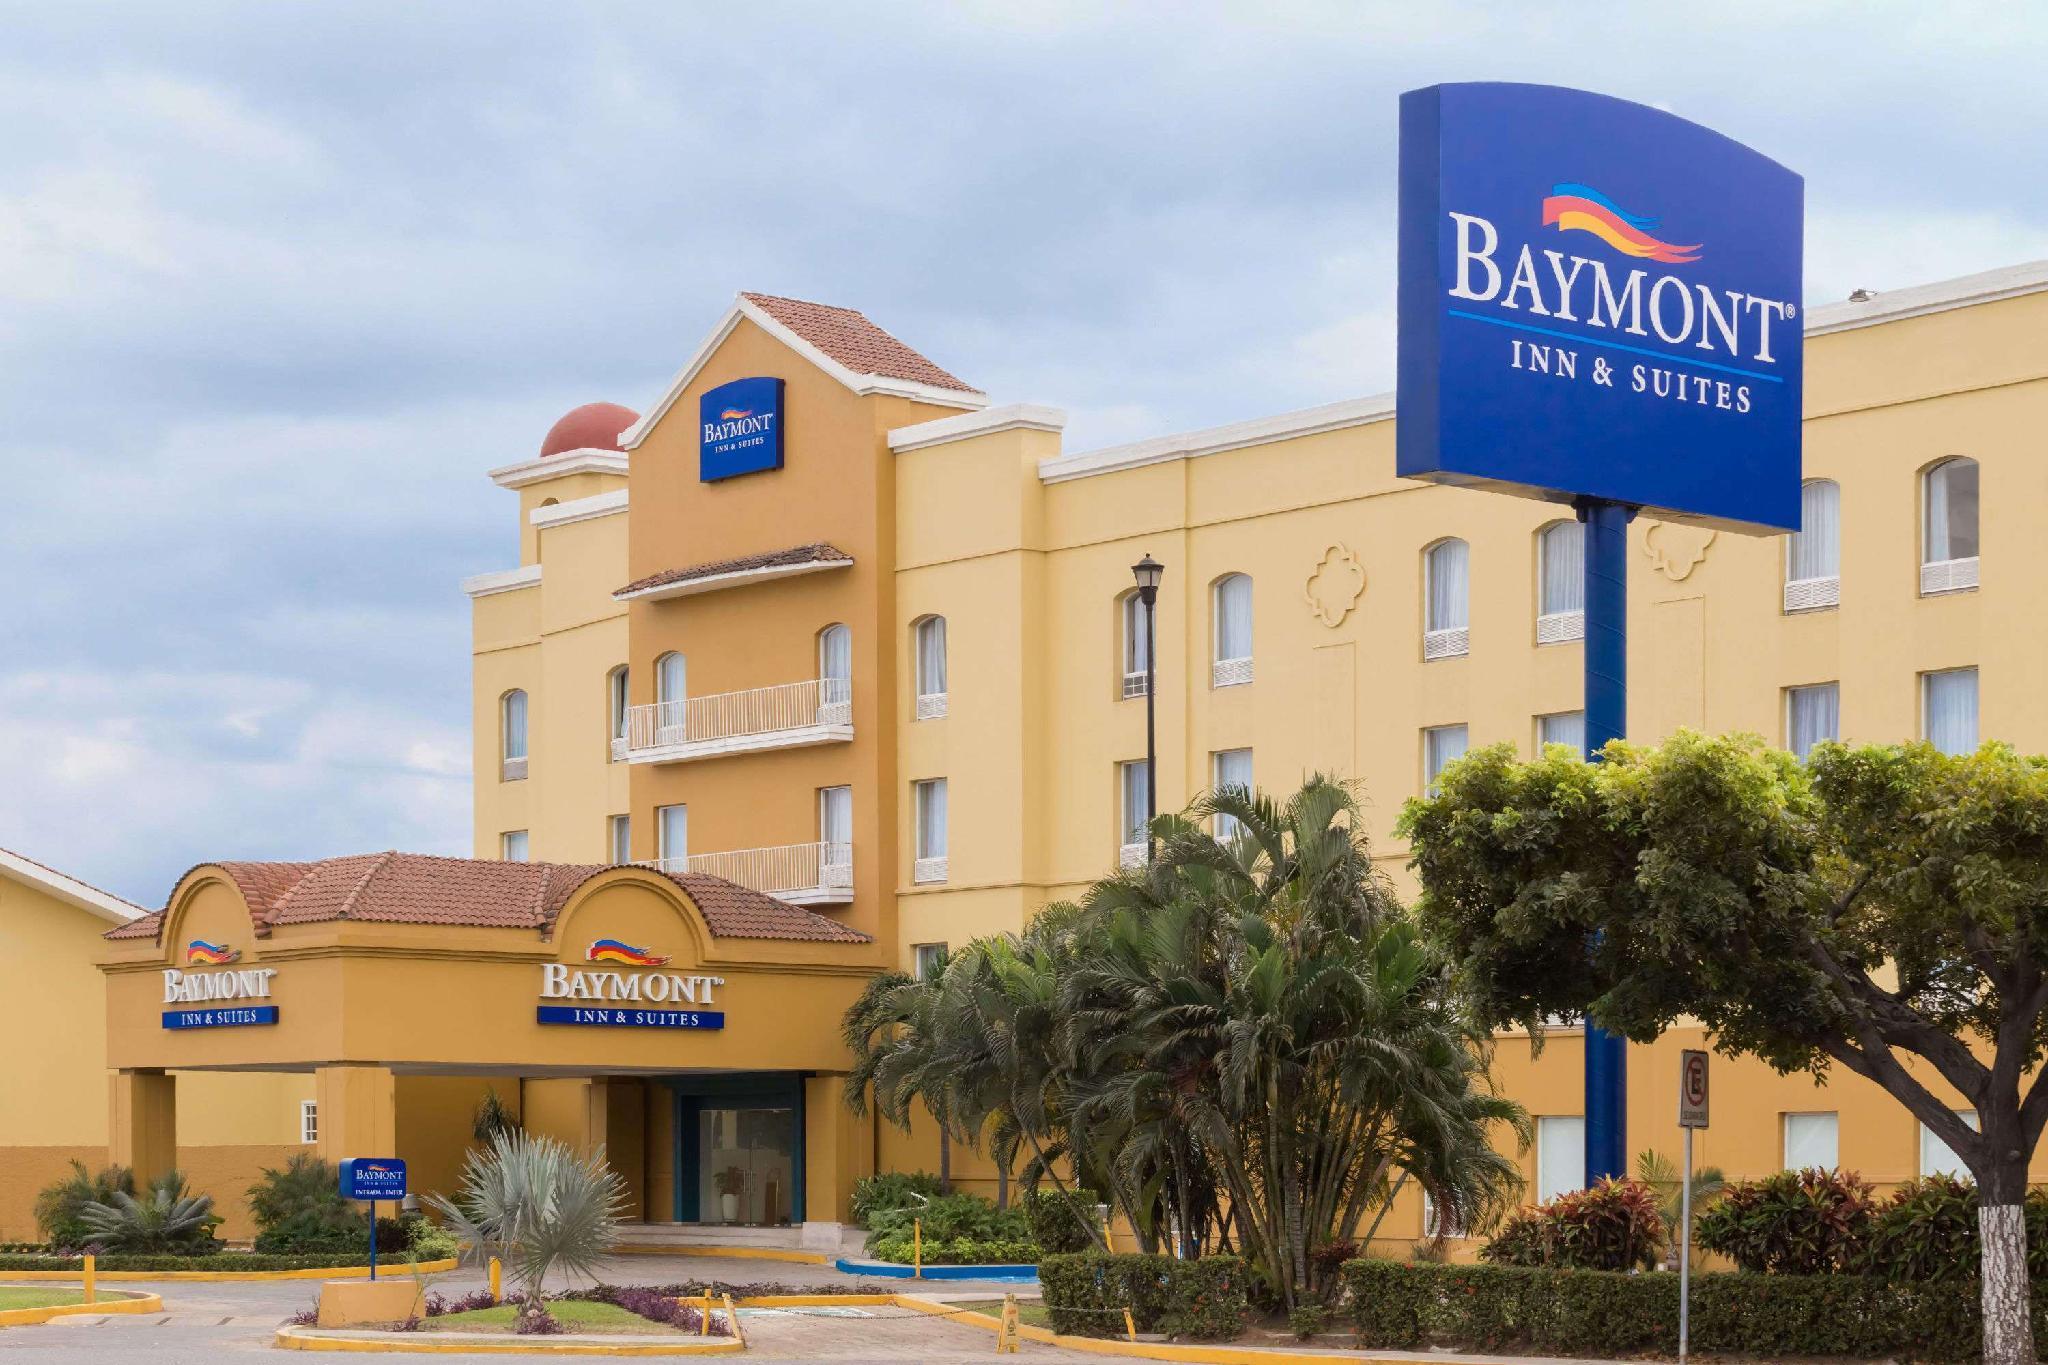 Baymont Inn And Suites Lazaro Cardenas